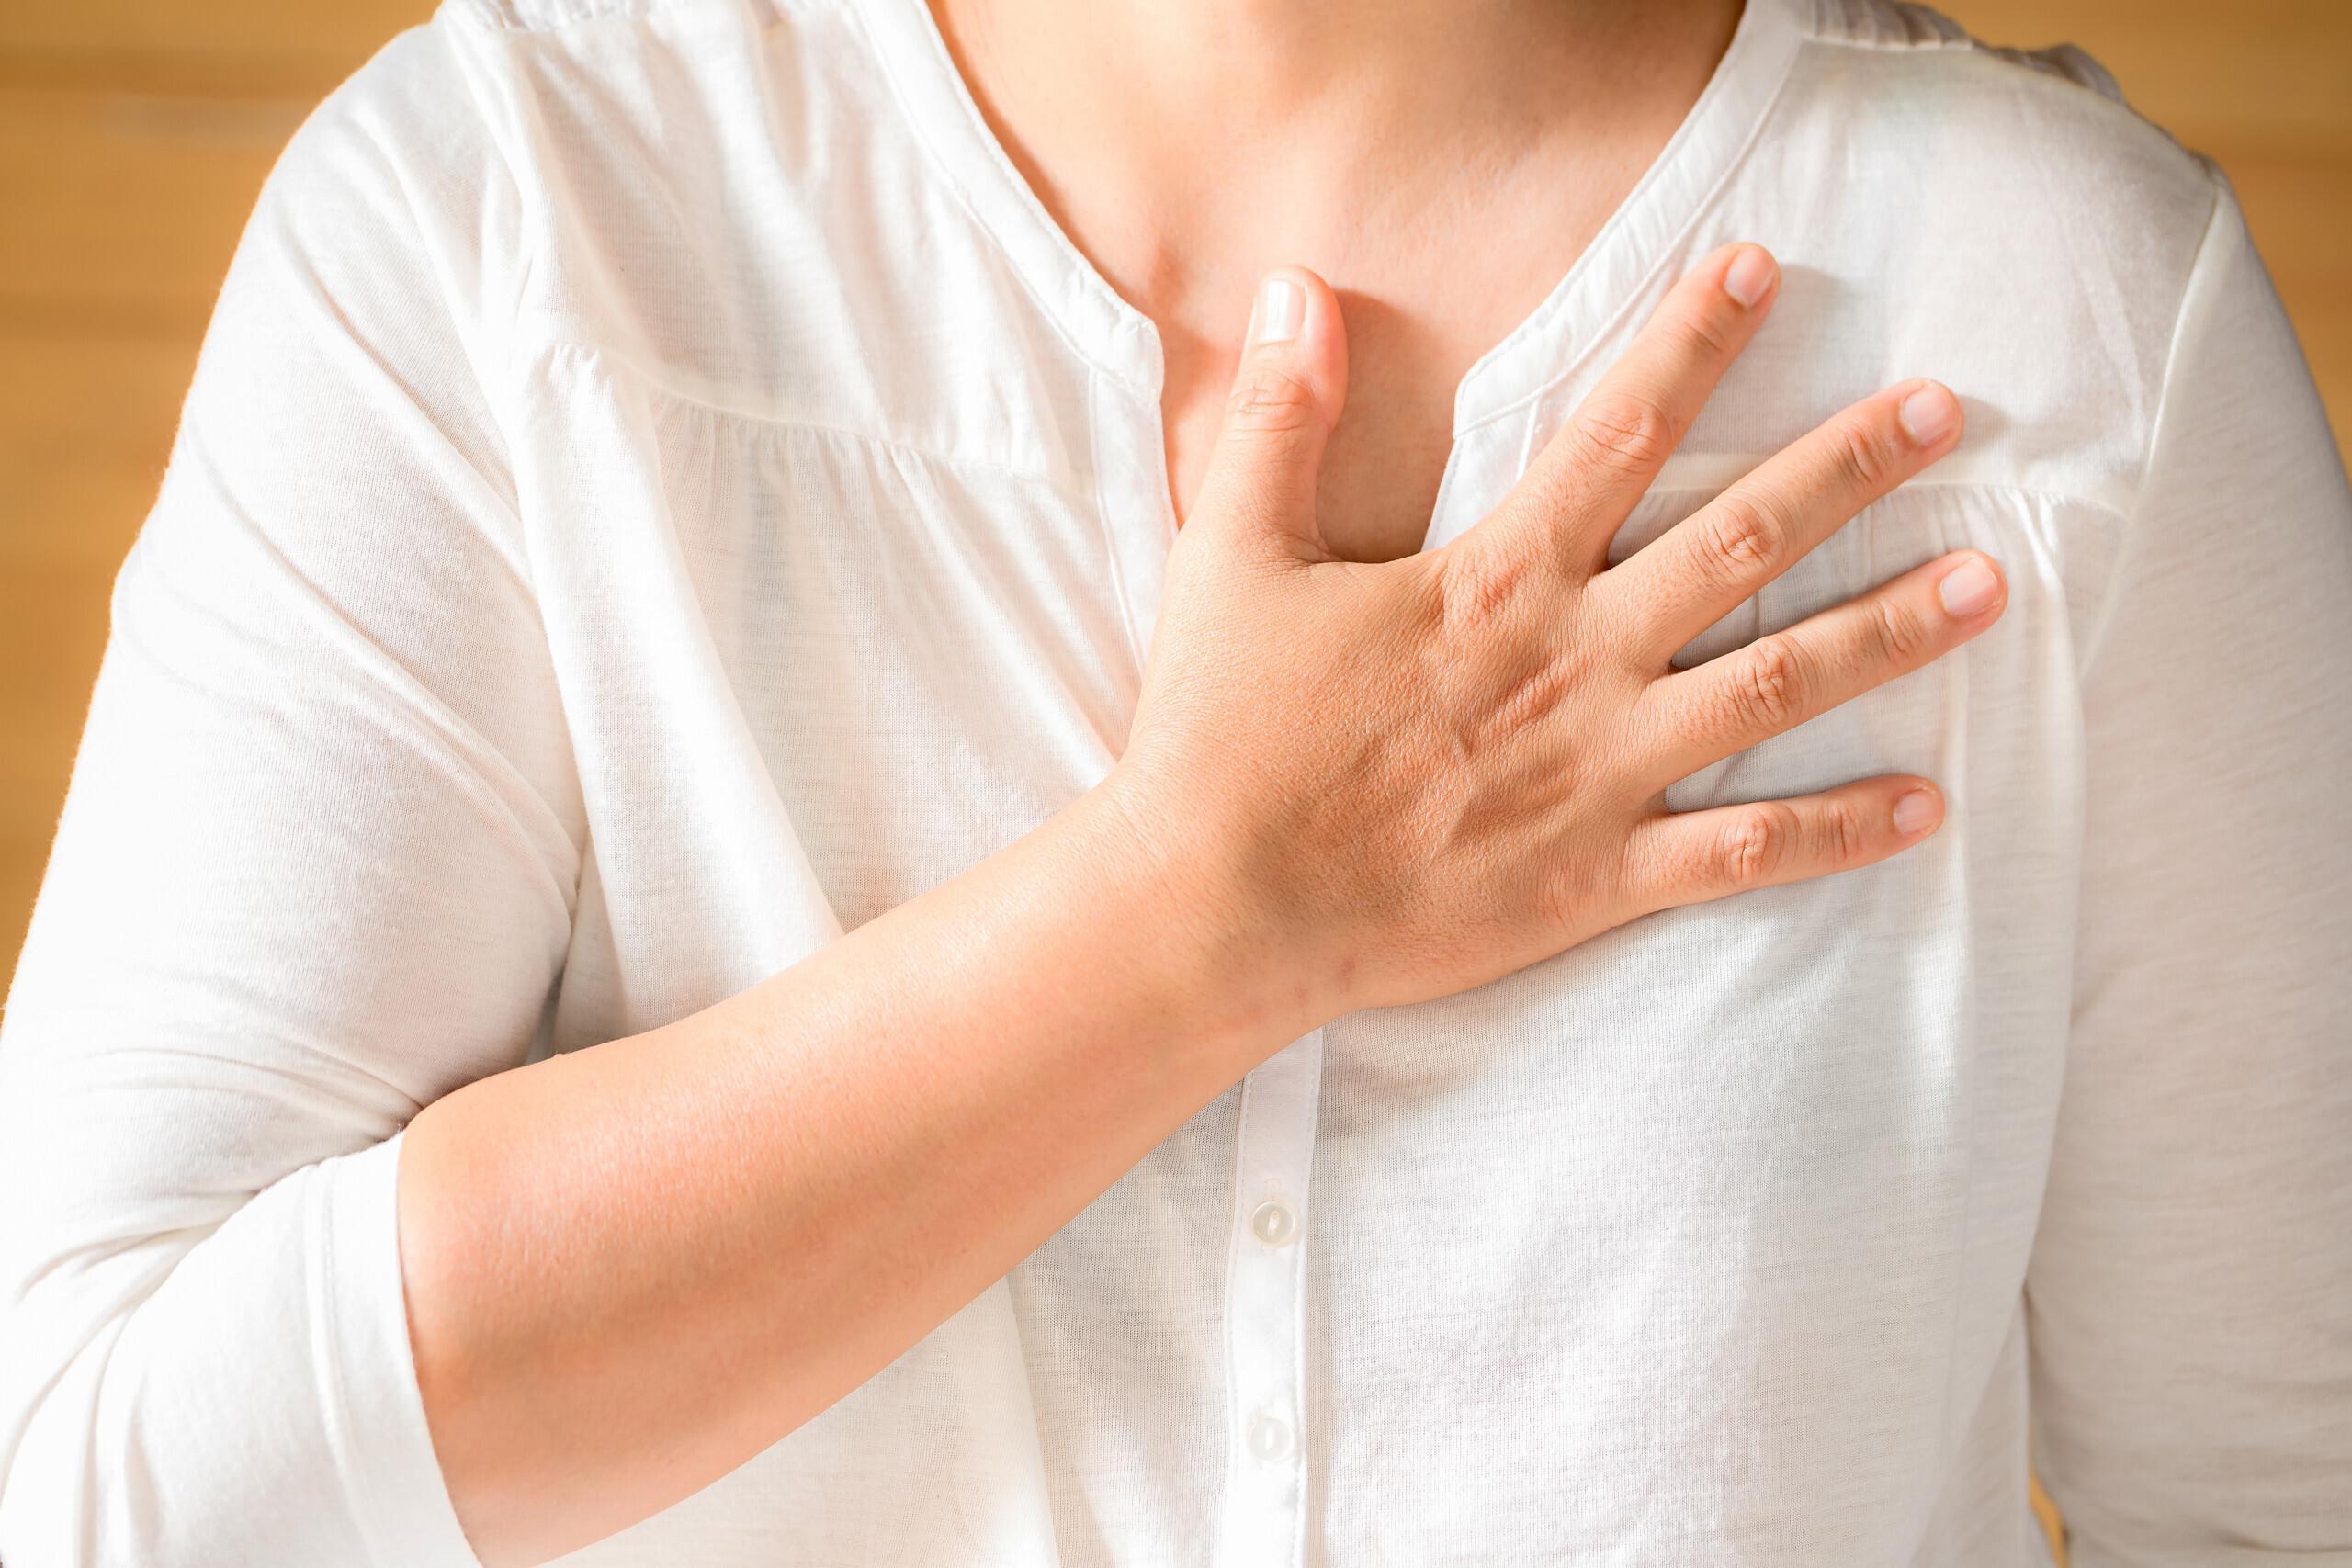 خونریزی نوک پستان به علت سرطان لوبولار